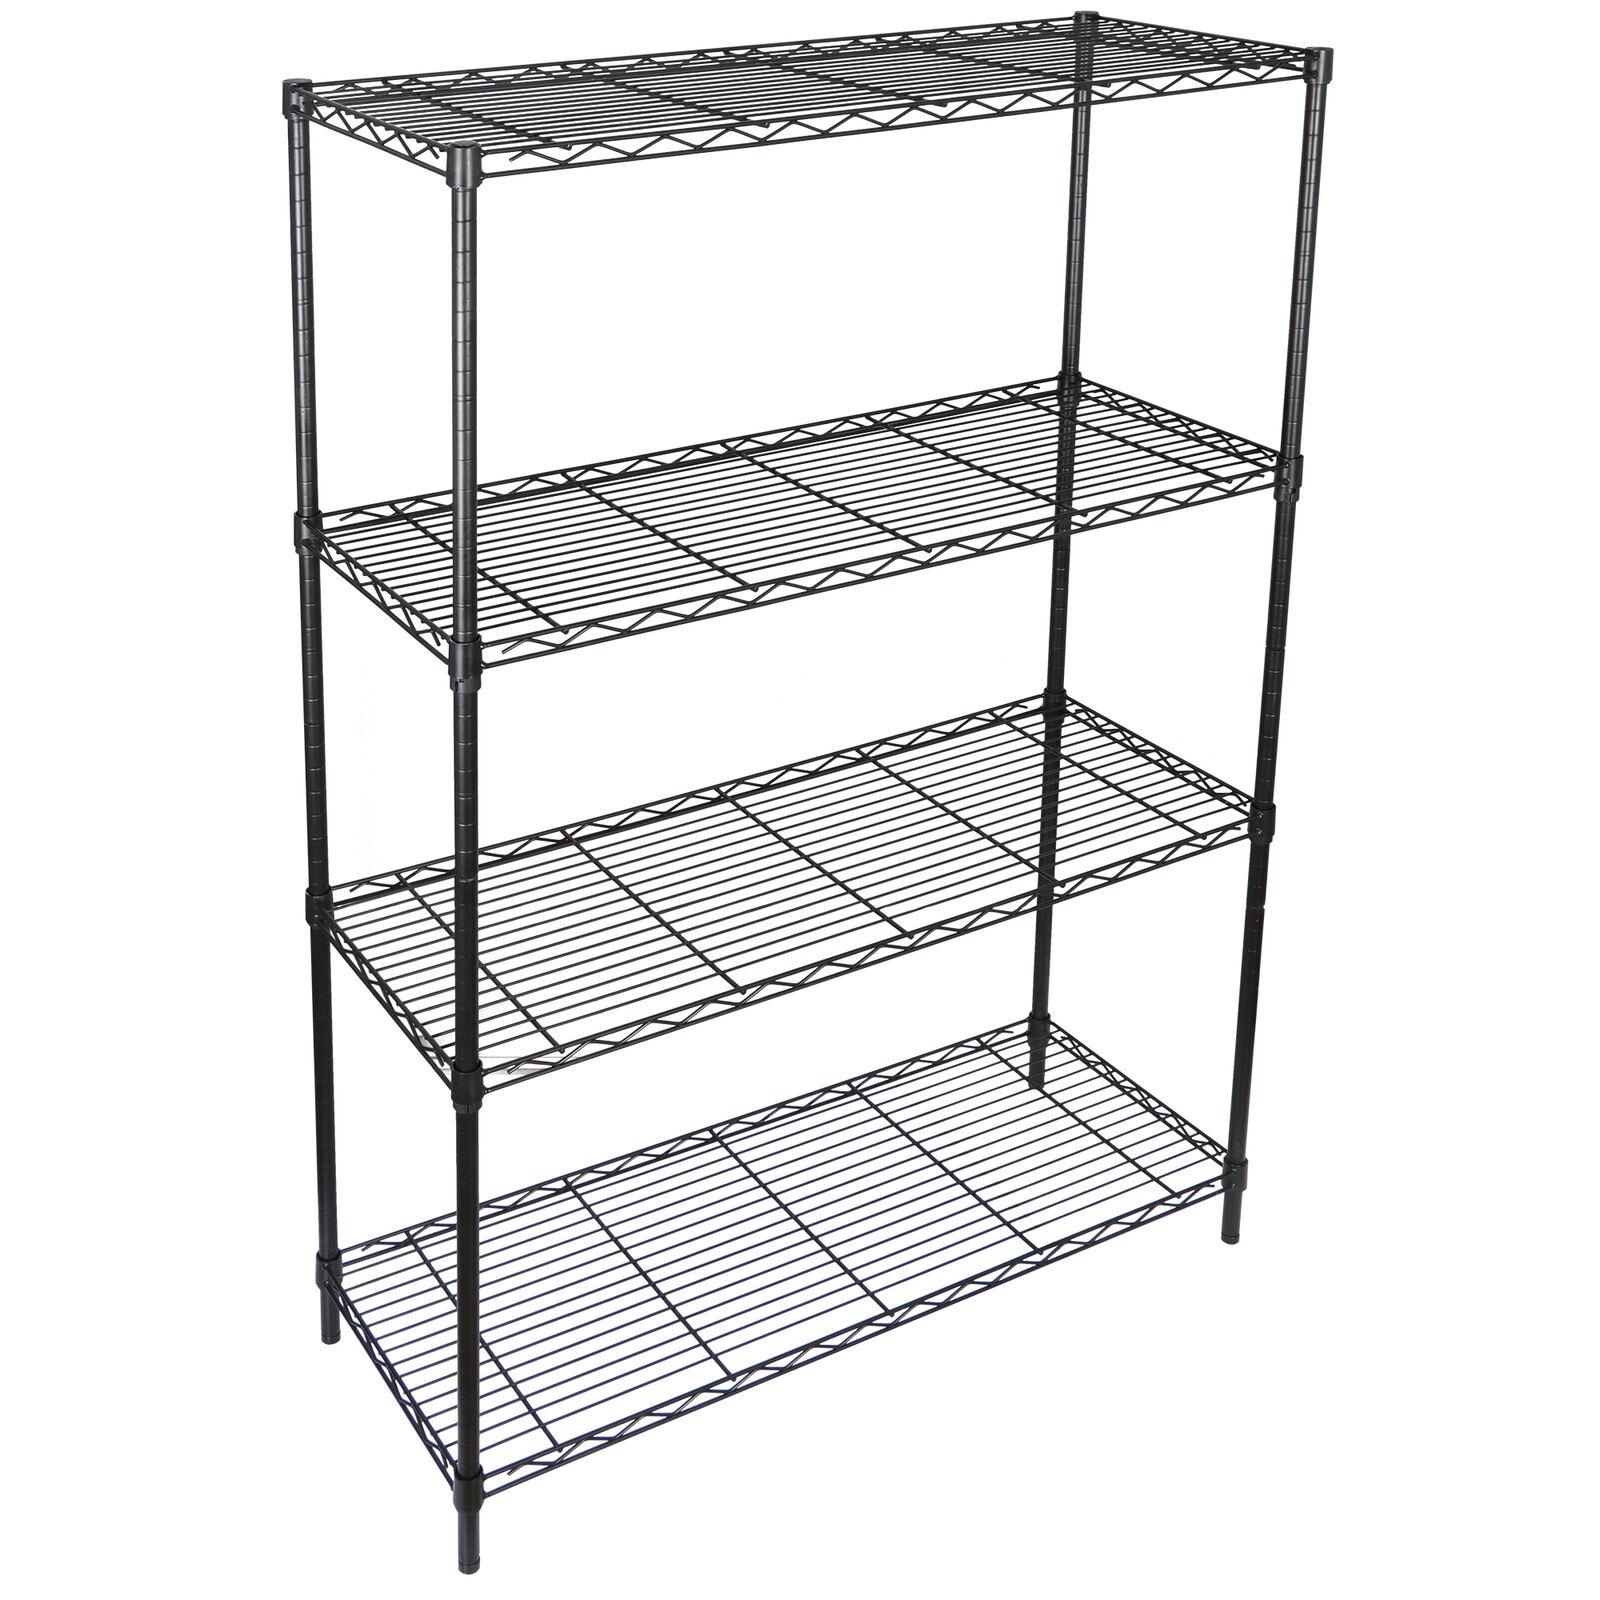 2x 4 Tier Steel Wire Shelf Rack Heavy Duty Storage Shelving Unit Kitchen Pantry Home & Garden